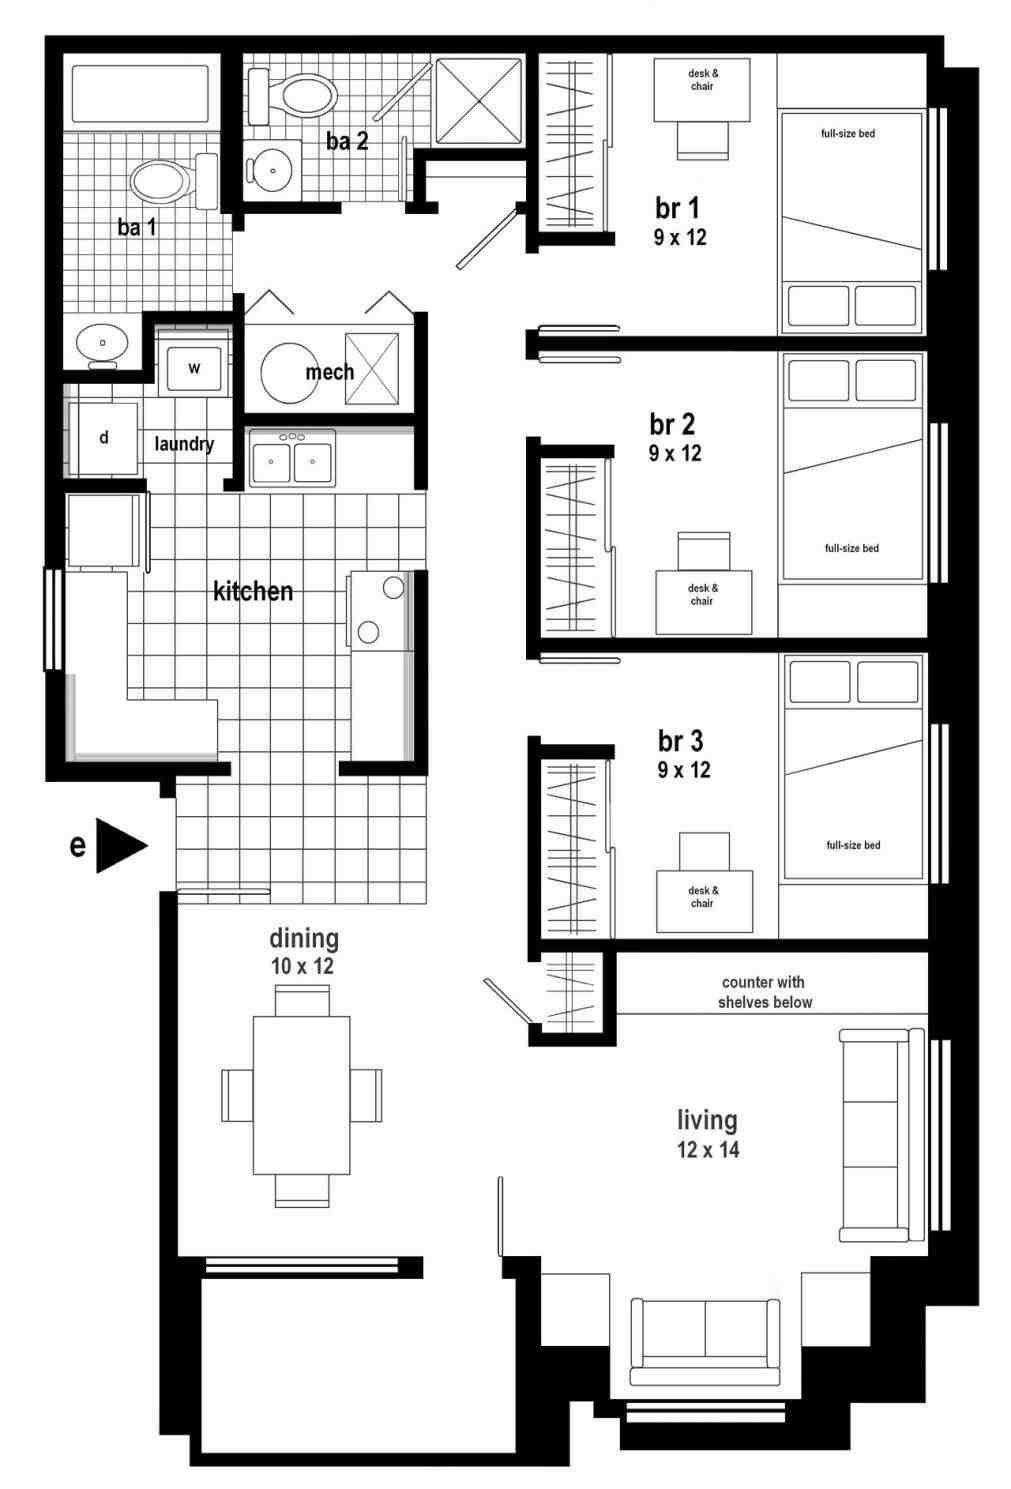 Apartment plans bedroom silicon valley salita  house design ideas storey floor rishabh kushwaha fresh also nurfatihah nurfatihahshazl on pinterest rh